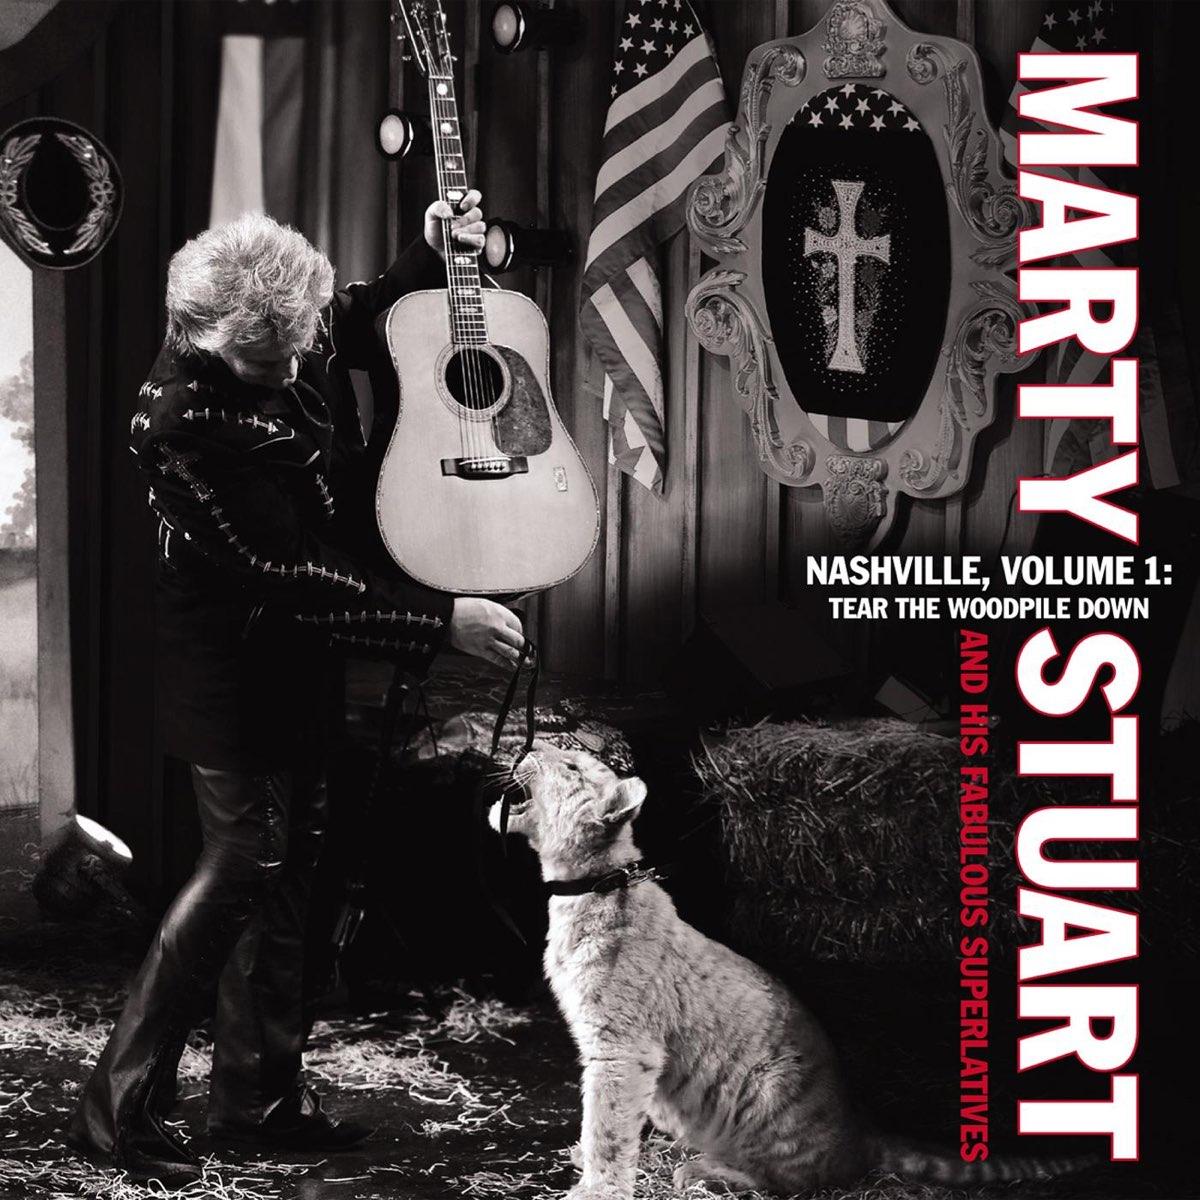 Marty Stuart, Nashville, Volume 1: Tear the Woodpile Down